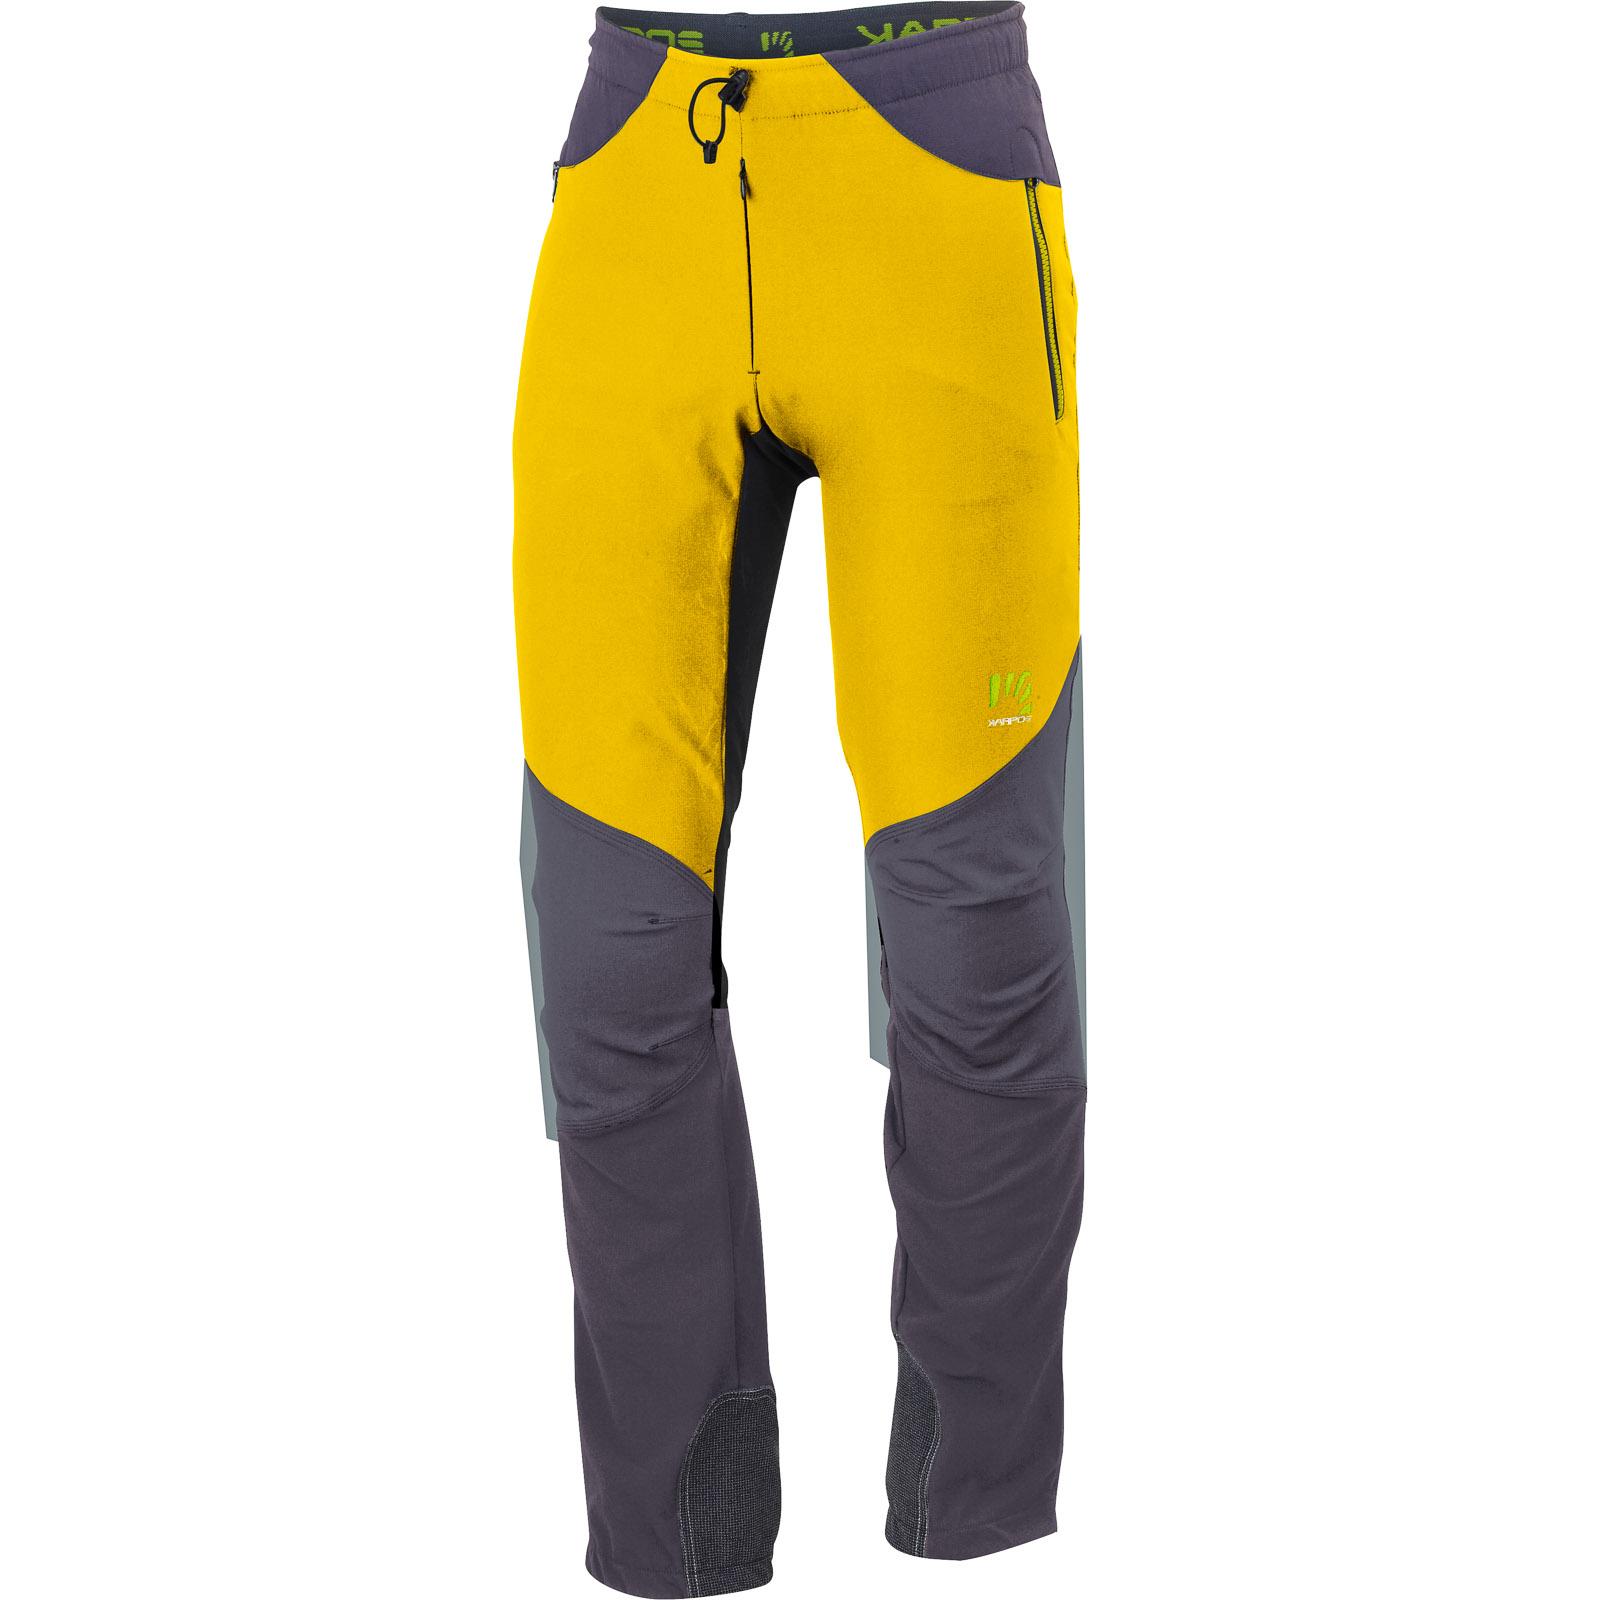 29aa0797a Karpos CEVEDALE nohavice žlté/sivé